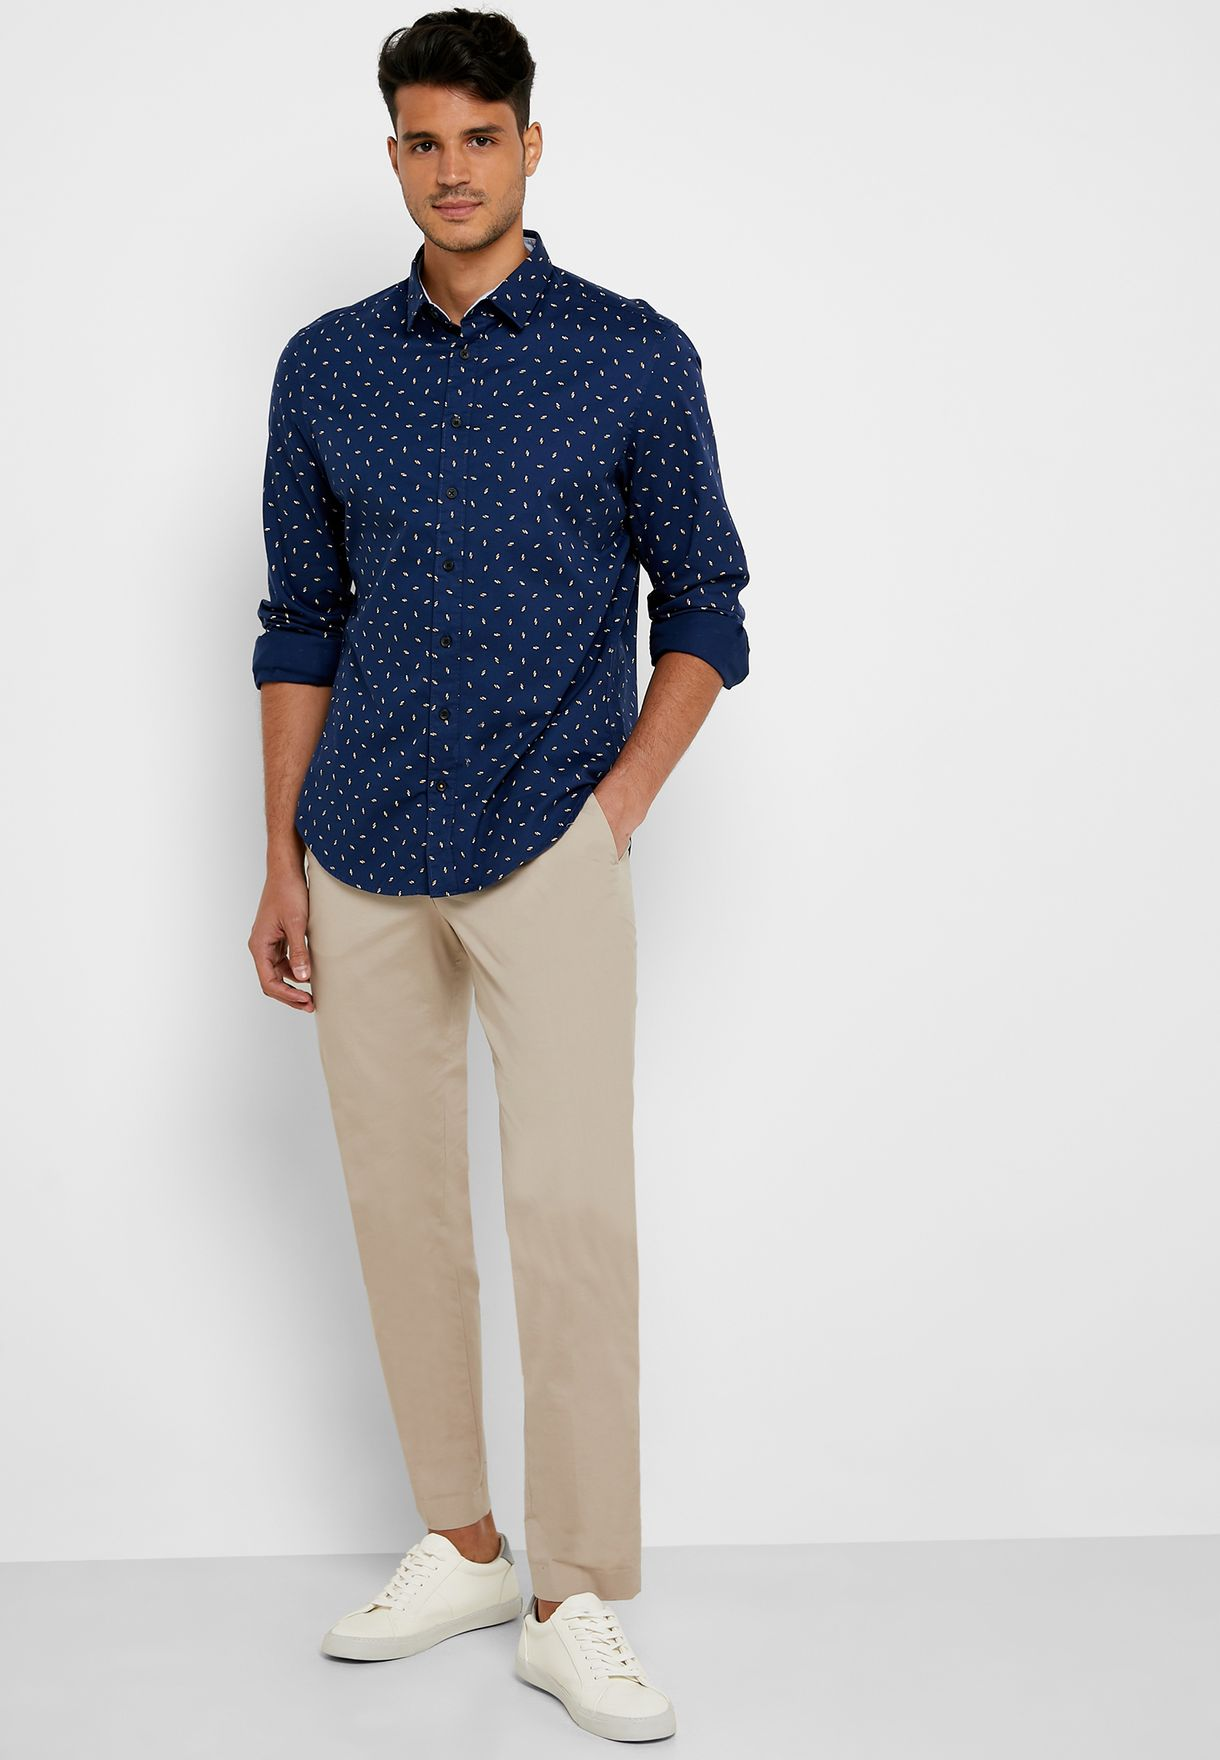 AOP Regular Fit Shirt